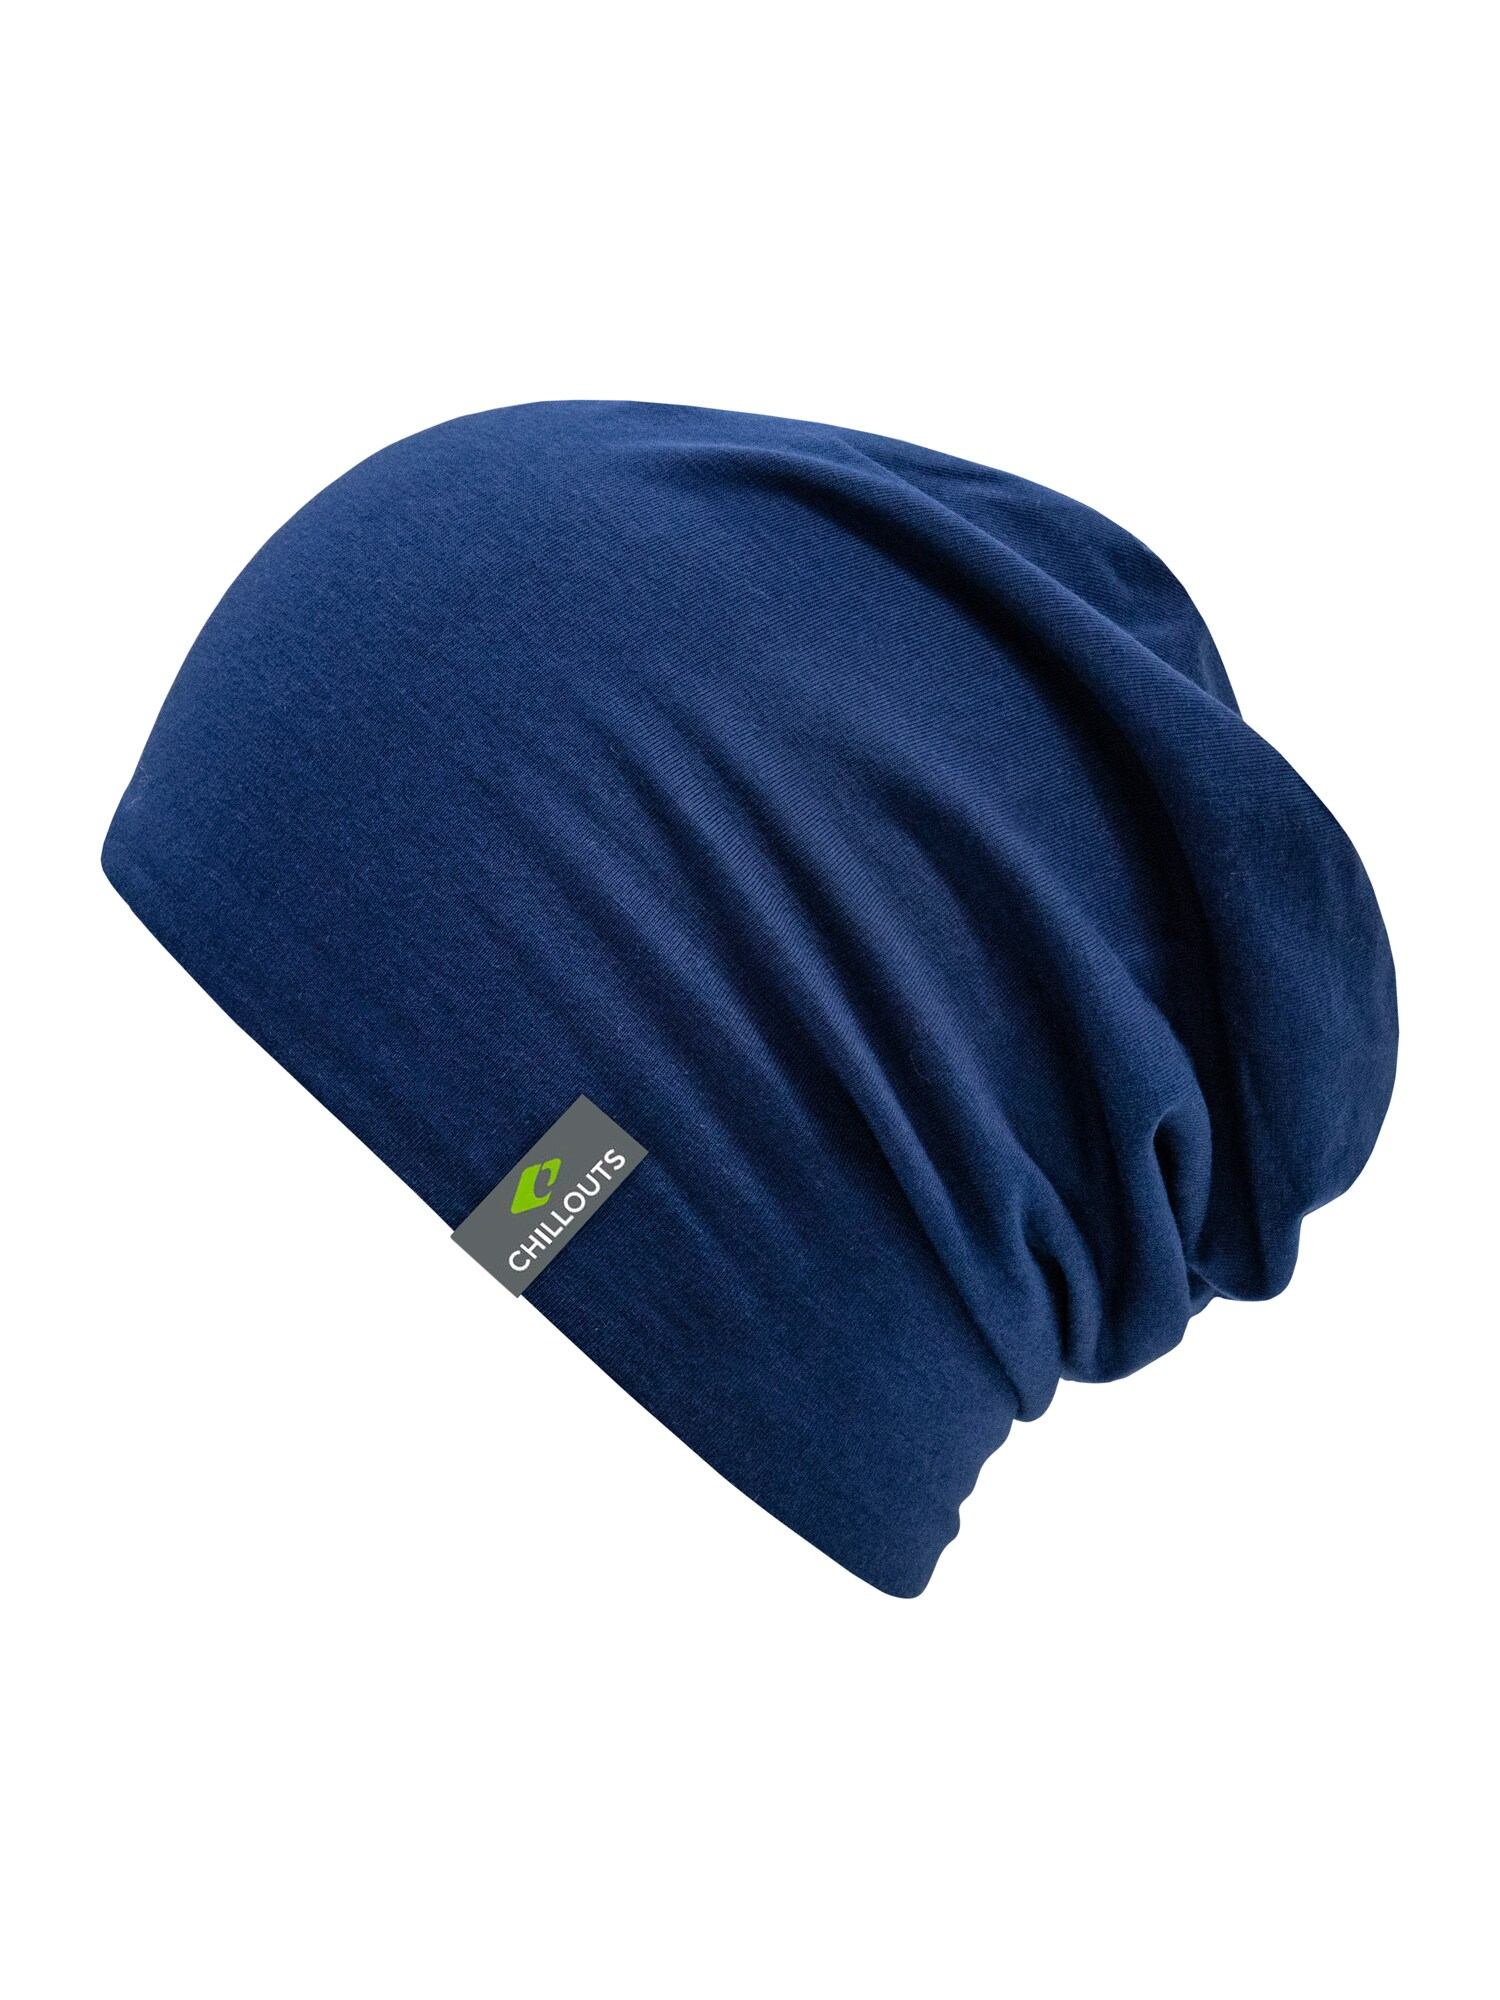 chillouts Megzta kepurė 'Acapulco' tamsiai mėlyna